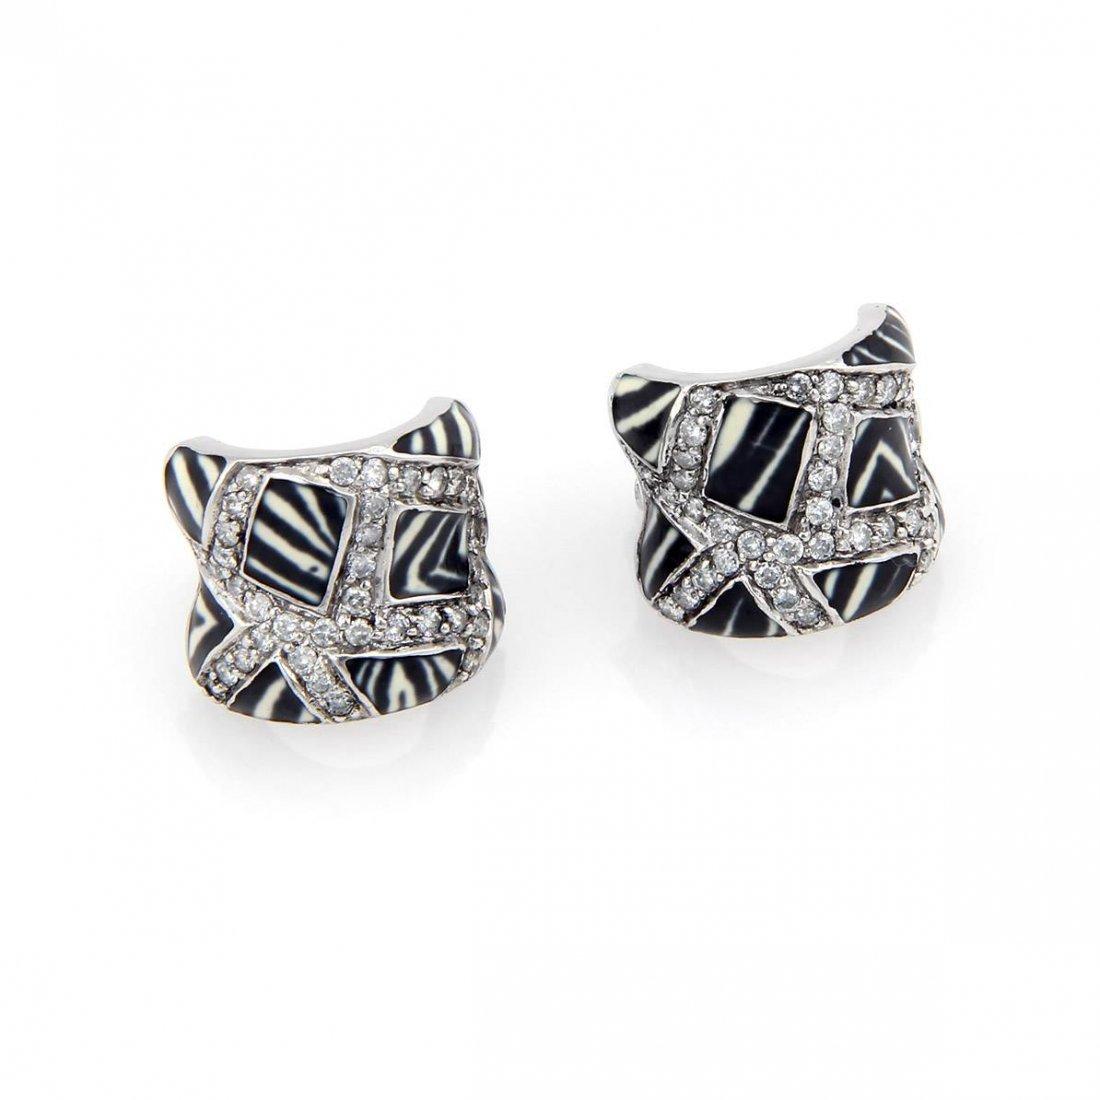 Estate 18K White Gold Fancy Diamond & Zebra Striped